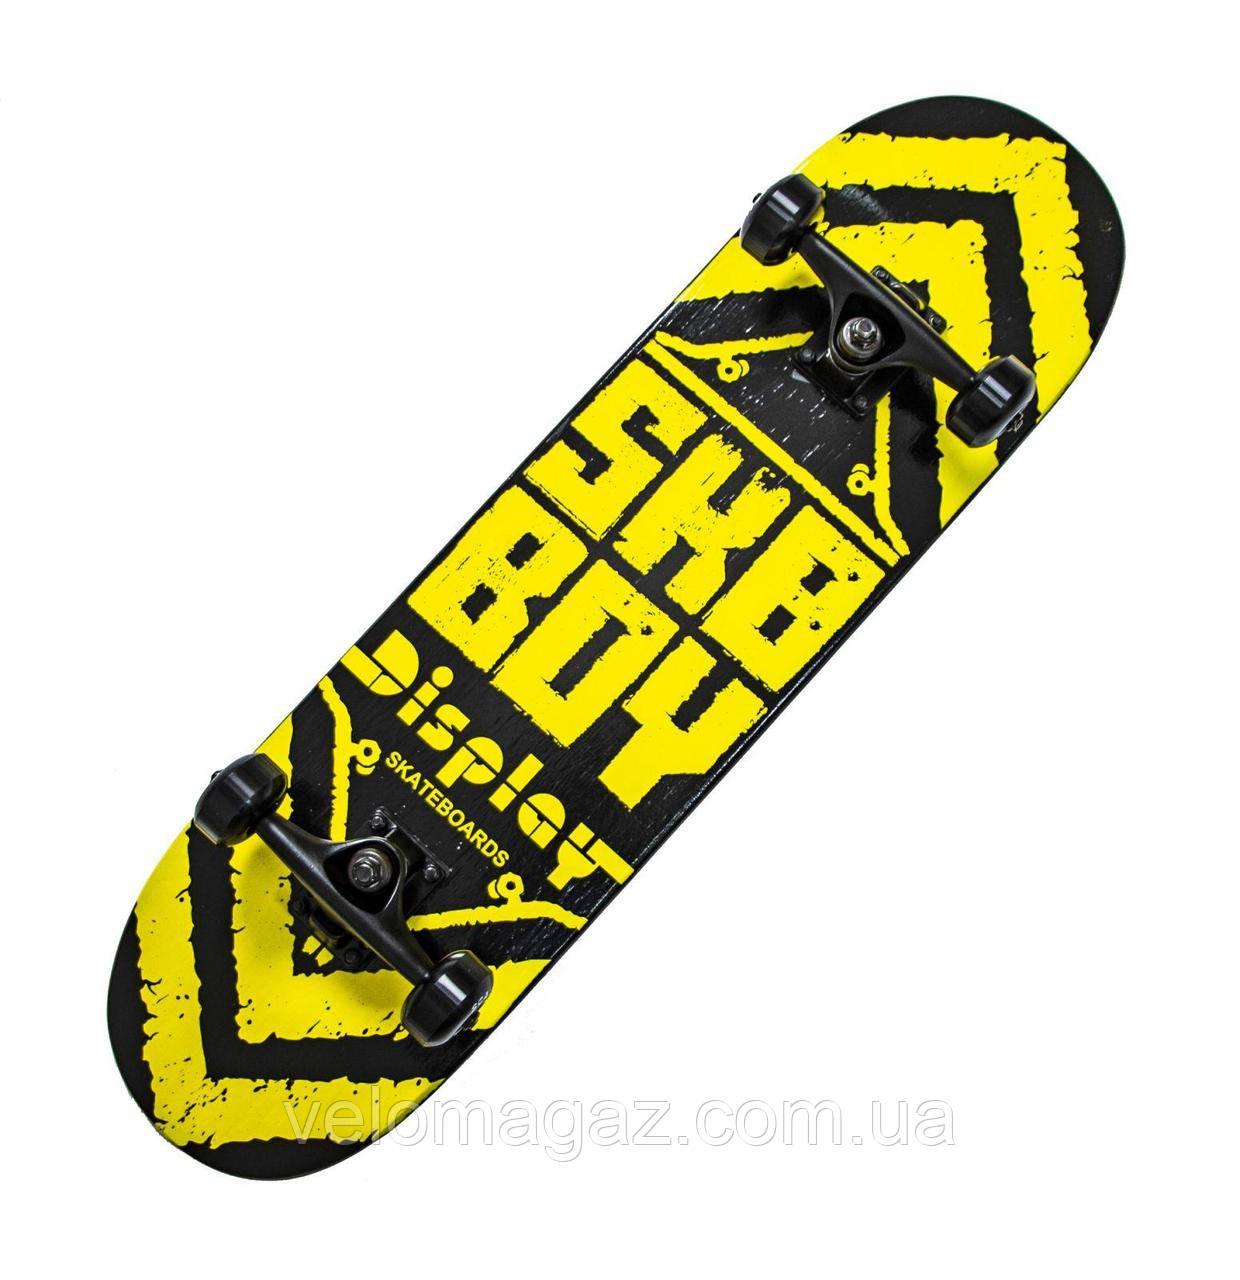 "Деревянный скейтборд ""SKY BOY"", желтый, 79*20 см"